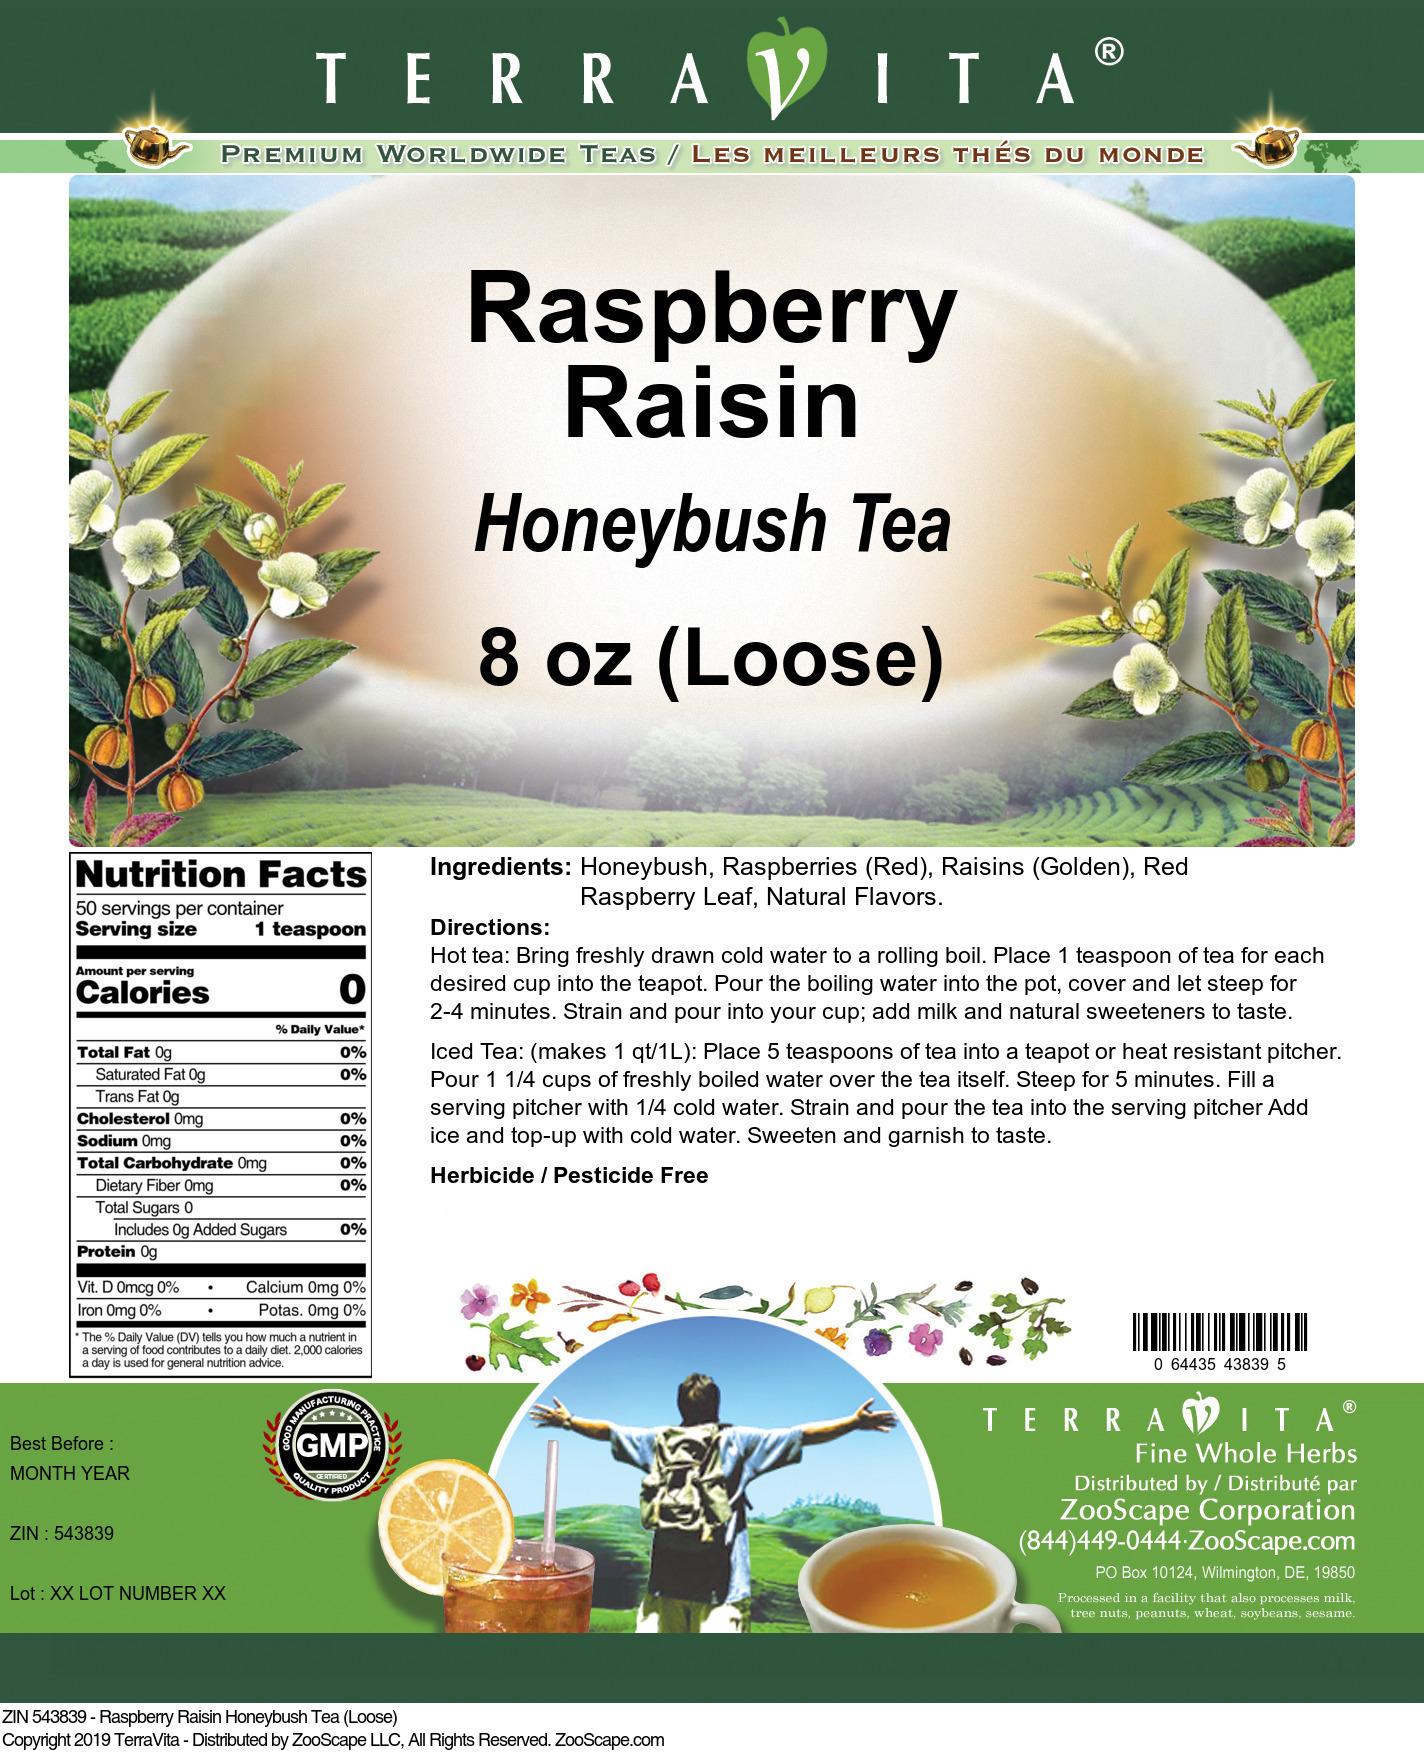 Raspberry Raisin Honeybush Tea (Loose)